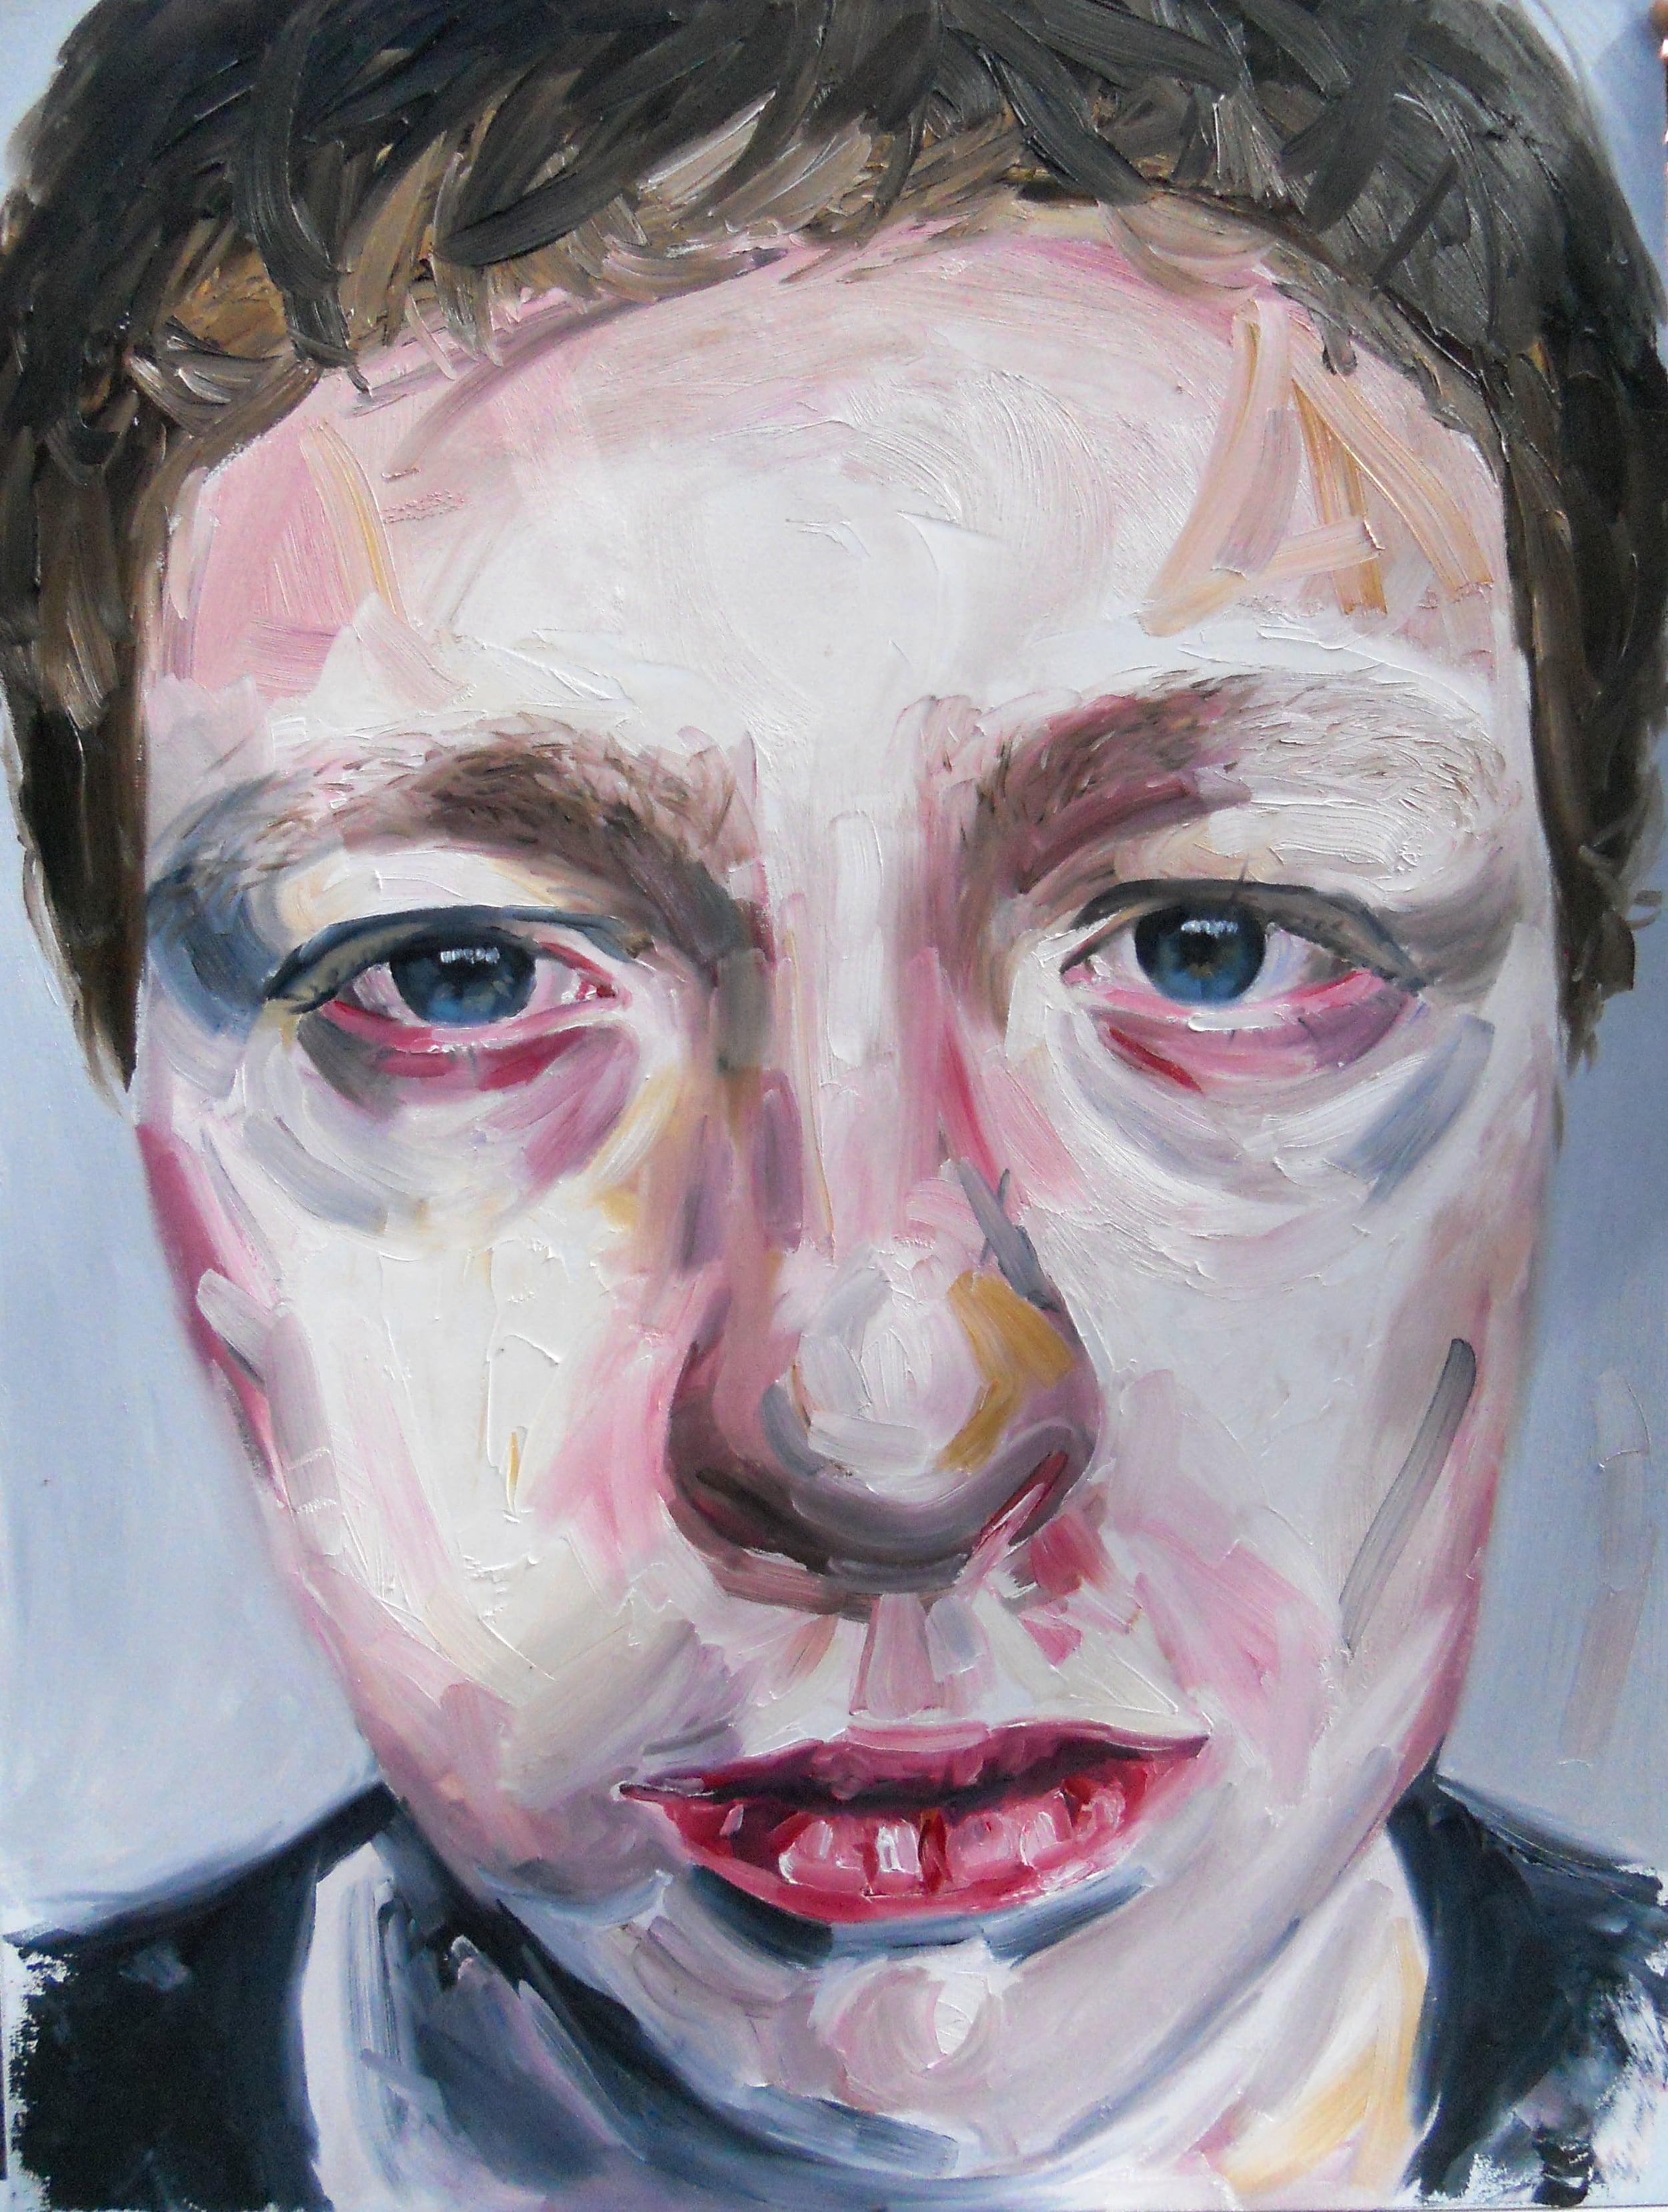 Student, Painting II